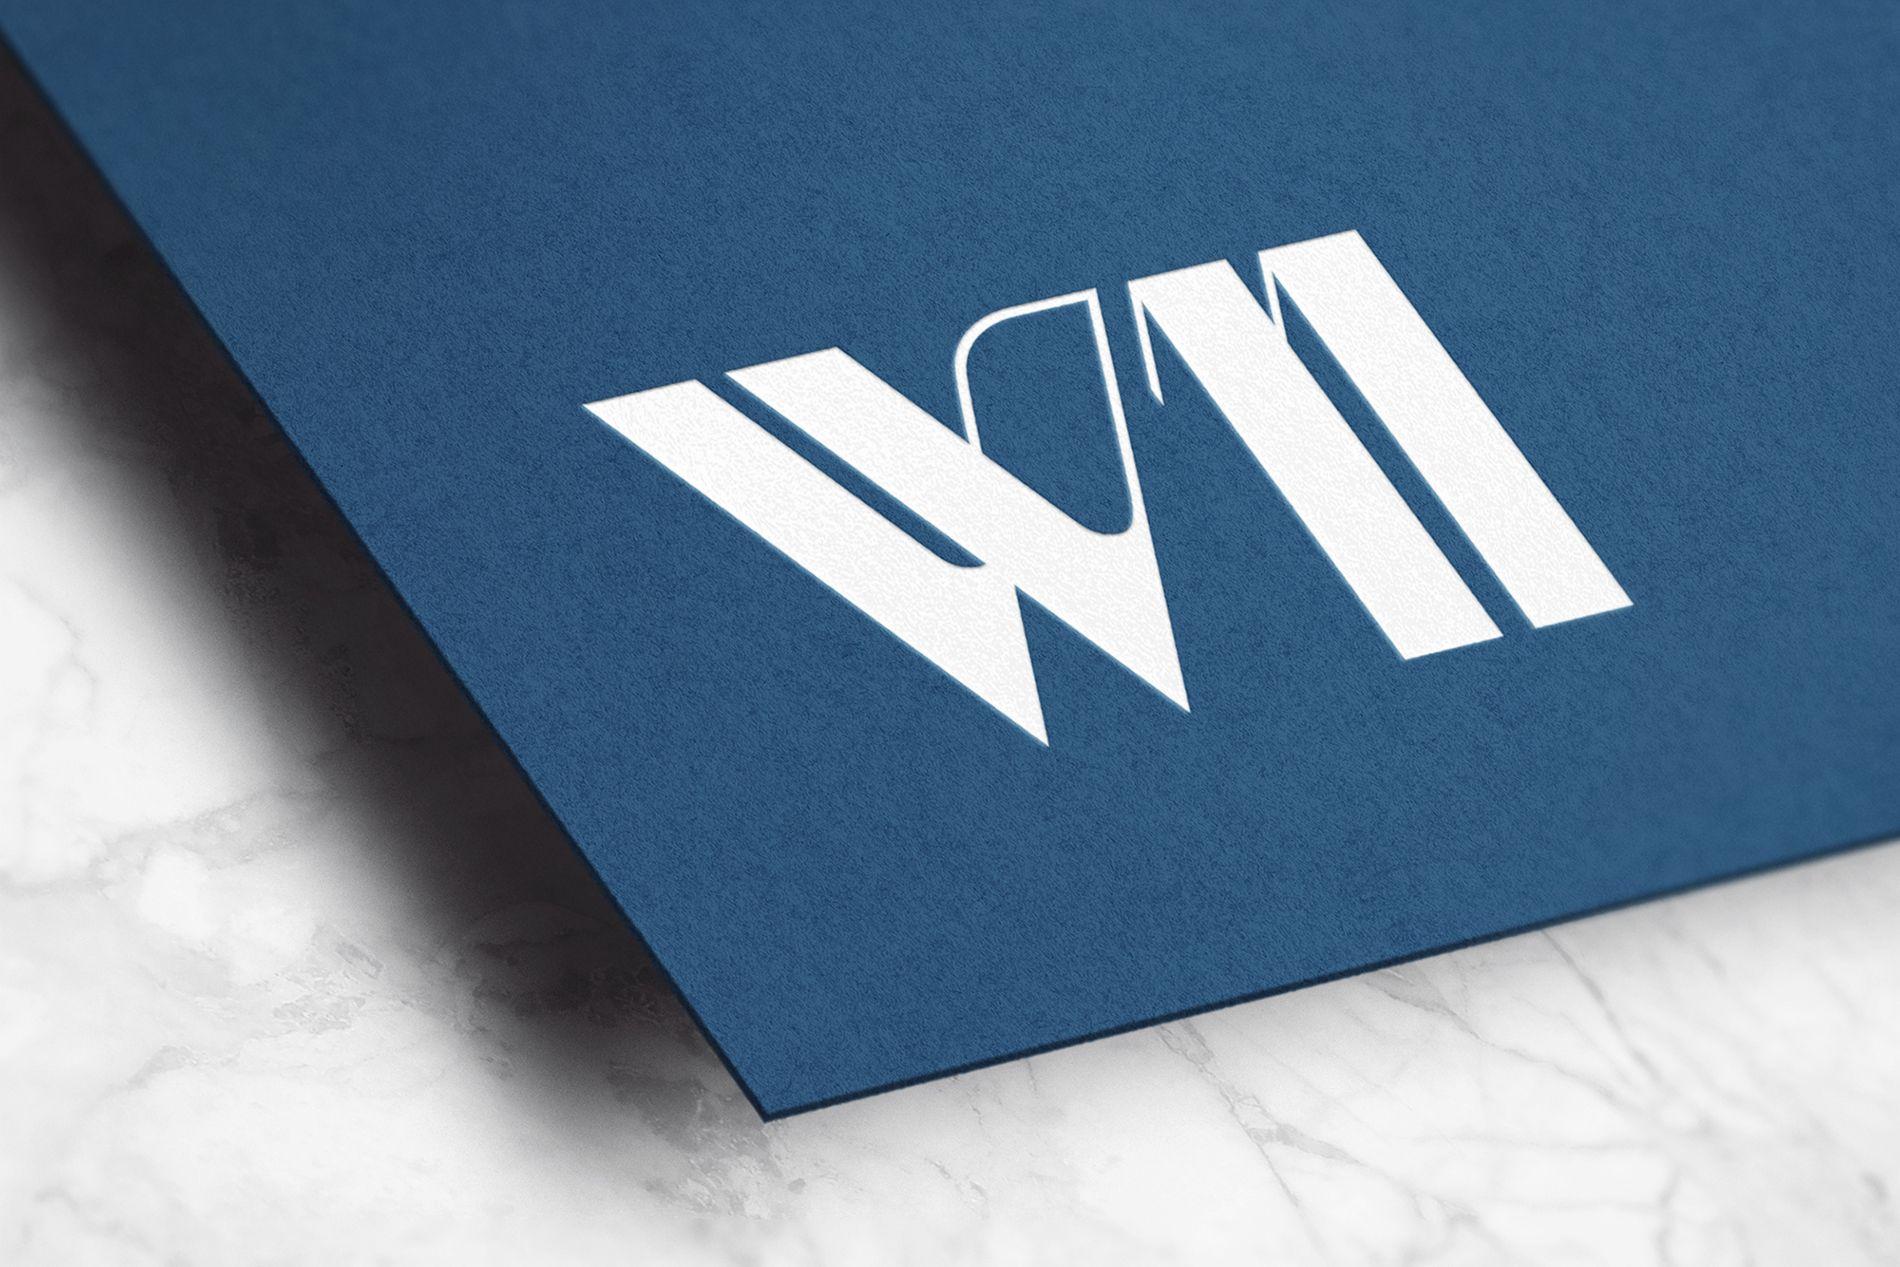 w11 construction logo